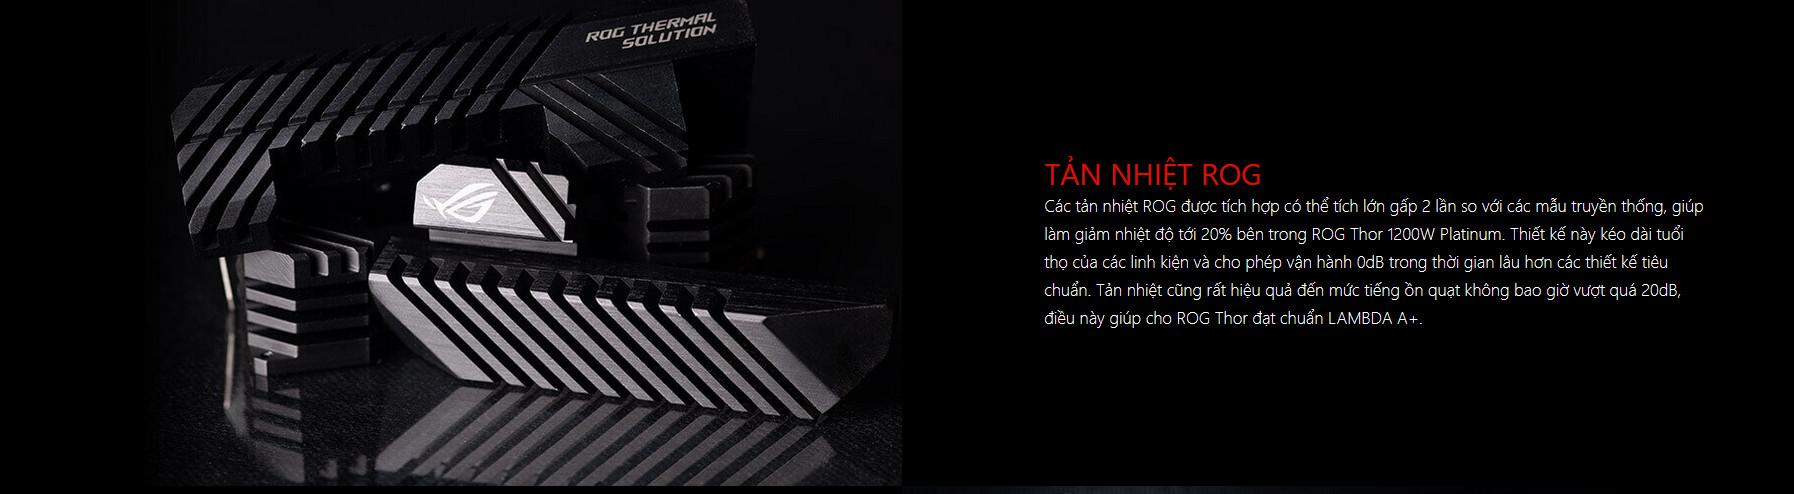 Nguồn Asus ROG Thor 1200W Platinum - RGB 1200W 80 Plus Platinum Full Modular thiết kế tản nhiệt